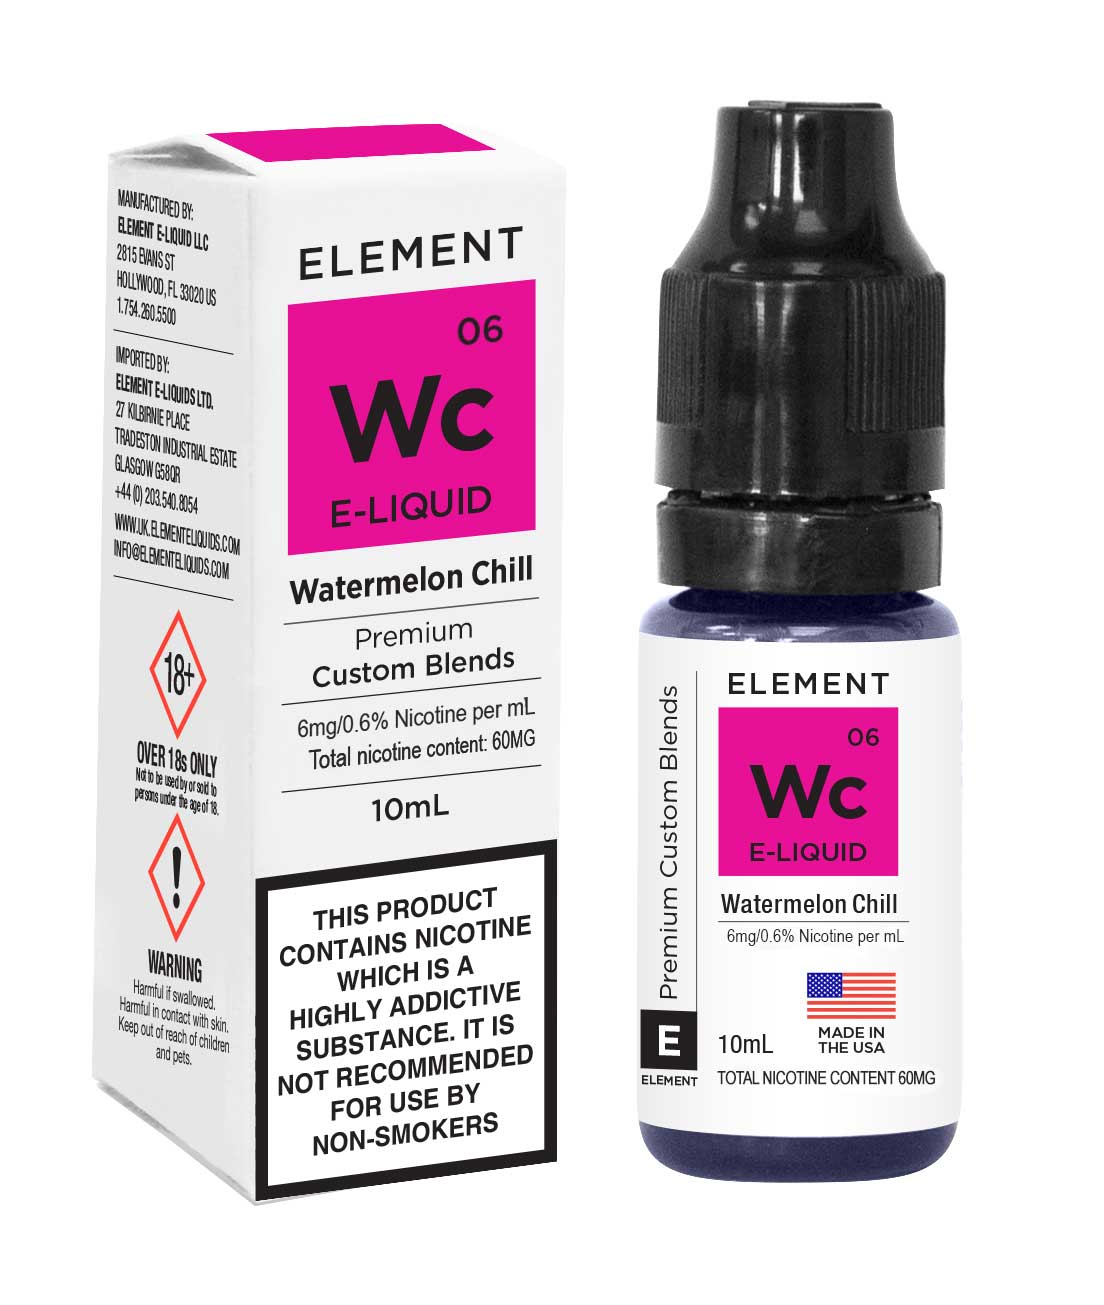 Compare prices for Element E-liquid Watermelon Chill Mint 10ml Bottle - 6mg Nicotine